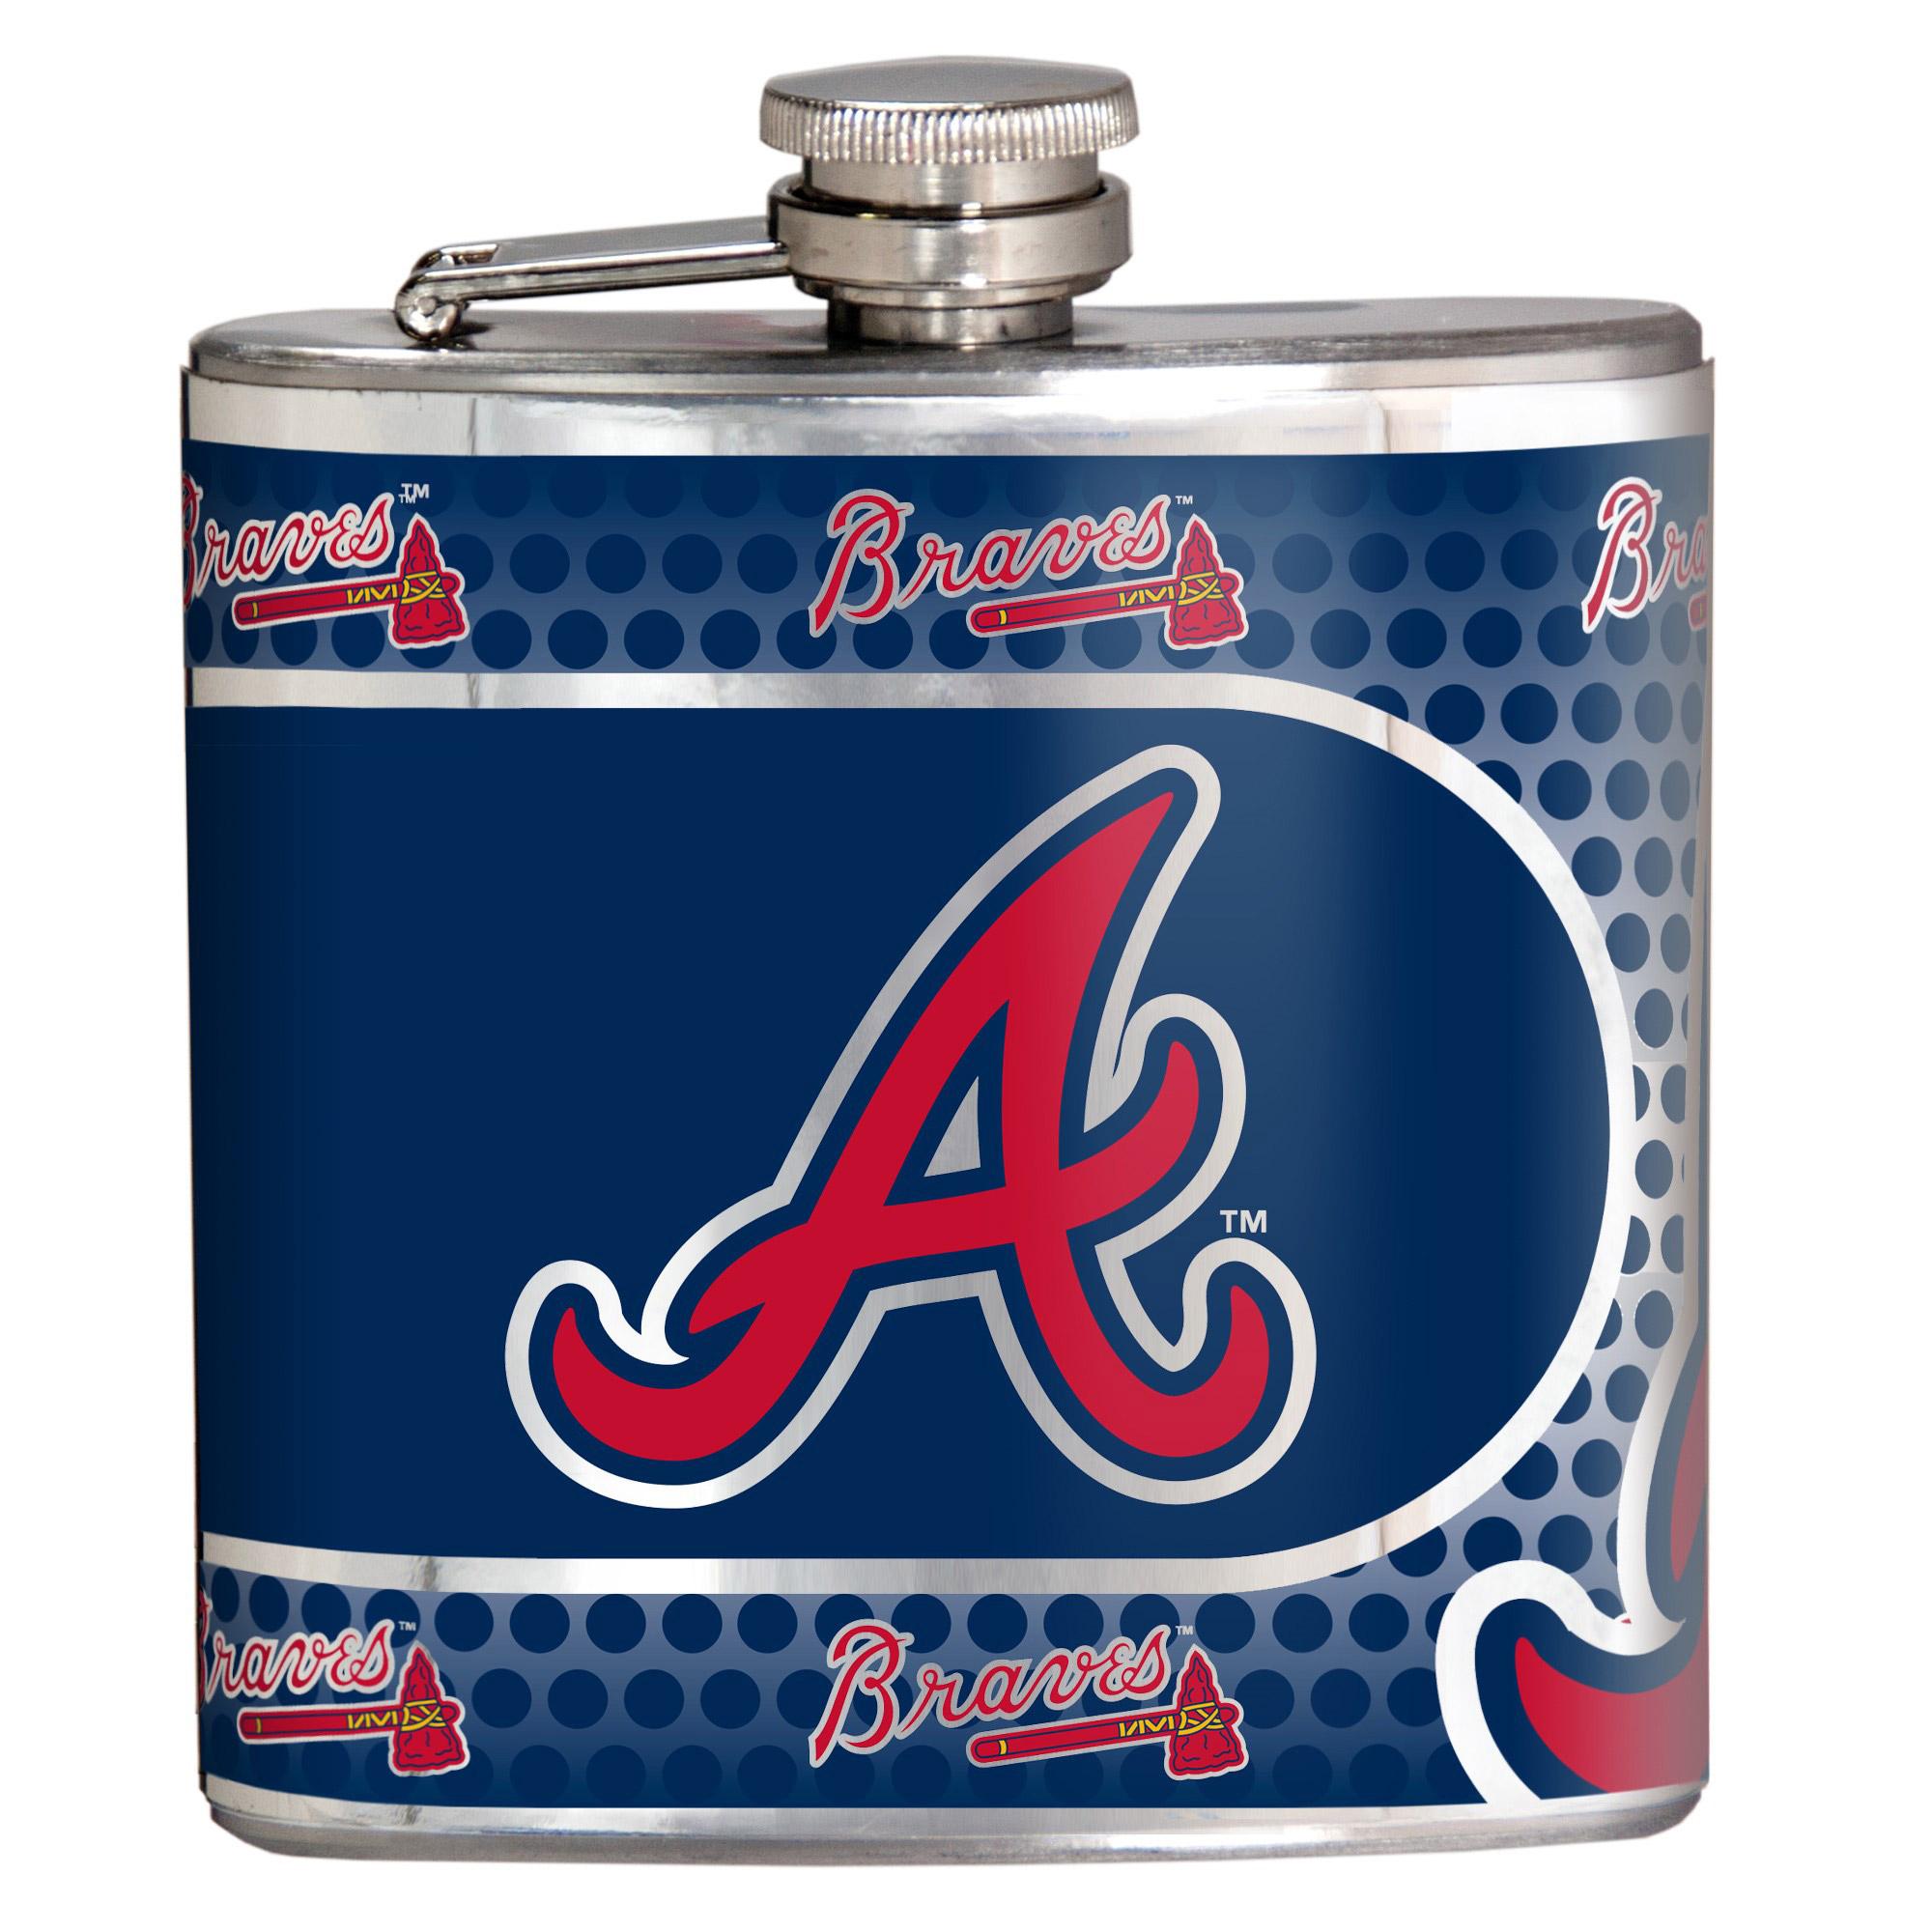 Atlanta Braves 6oz. Stainless Steel Hip Flask - Silver - No Size